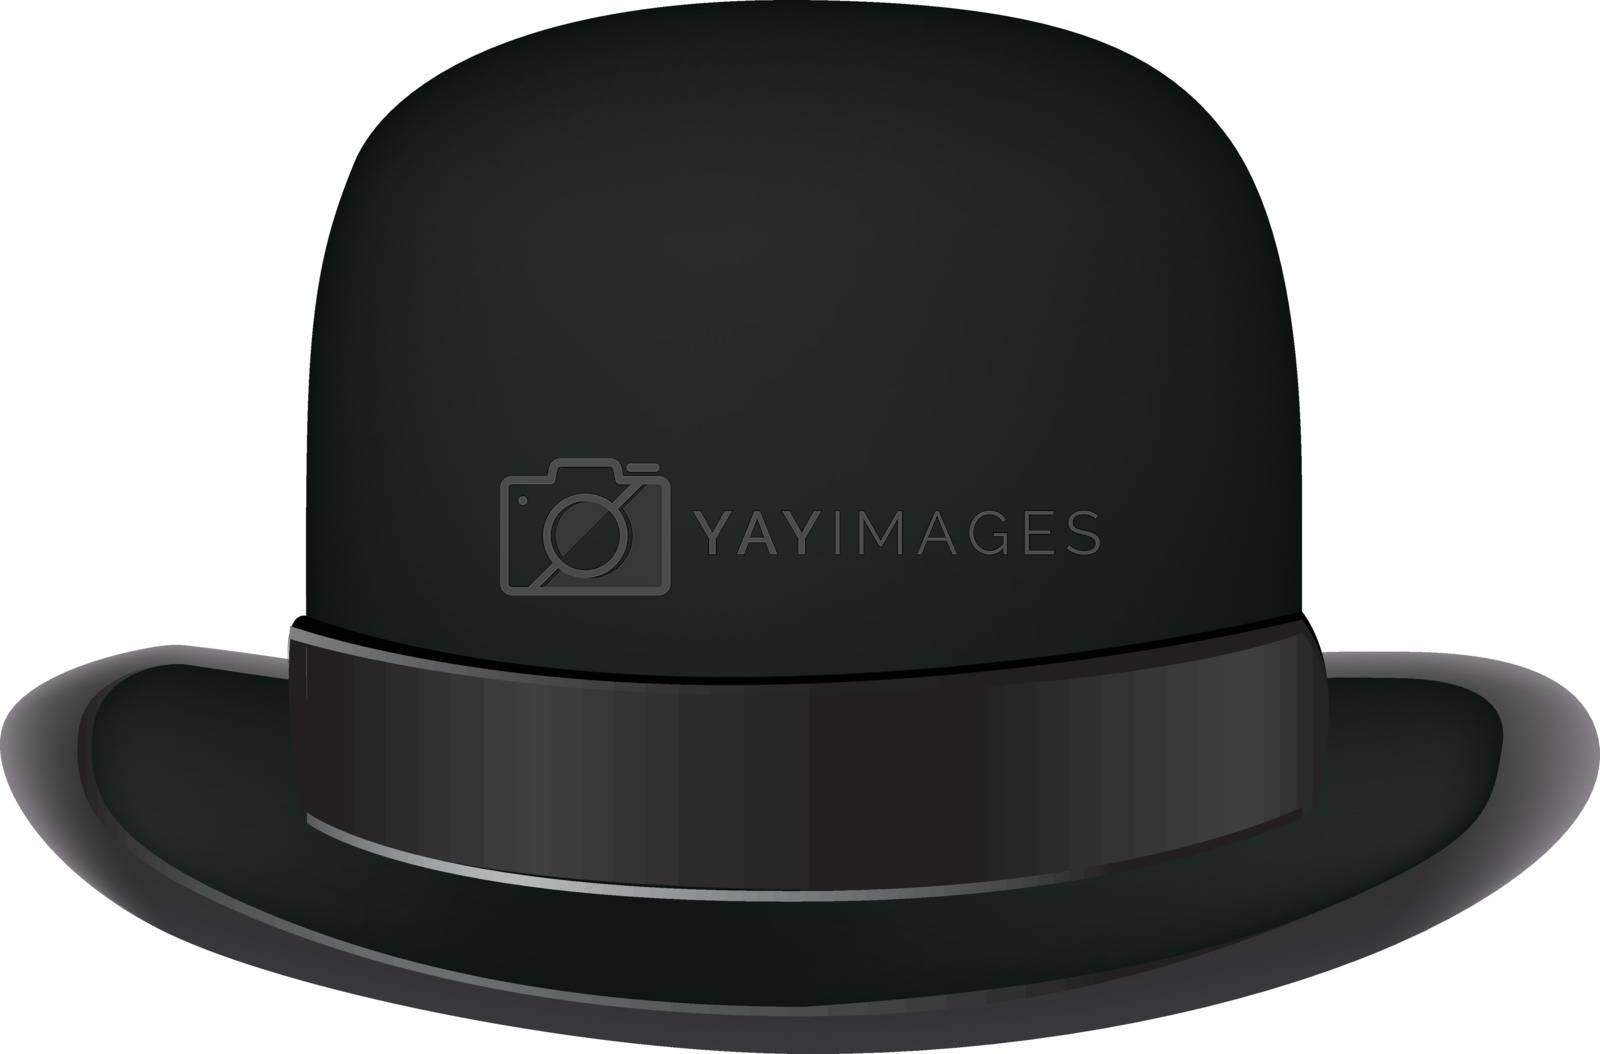 Royalty free image of Bowler hat by VIPDesignUSA